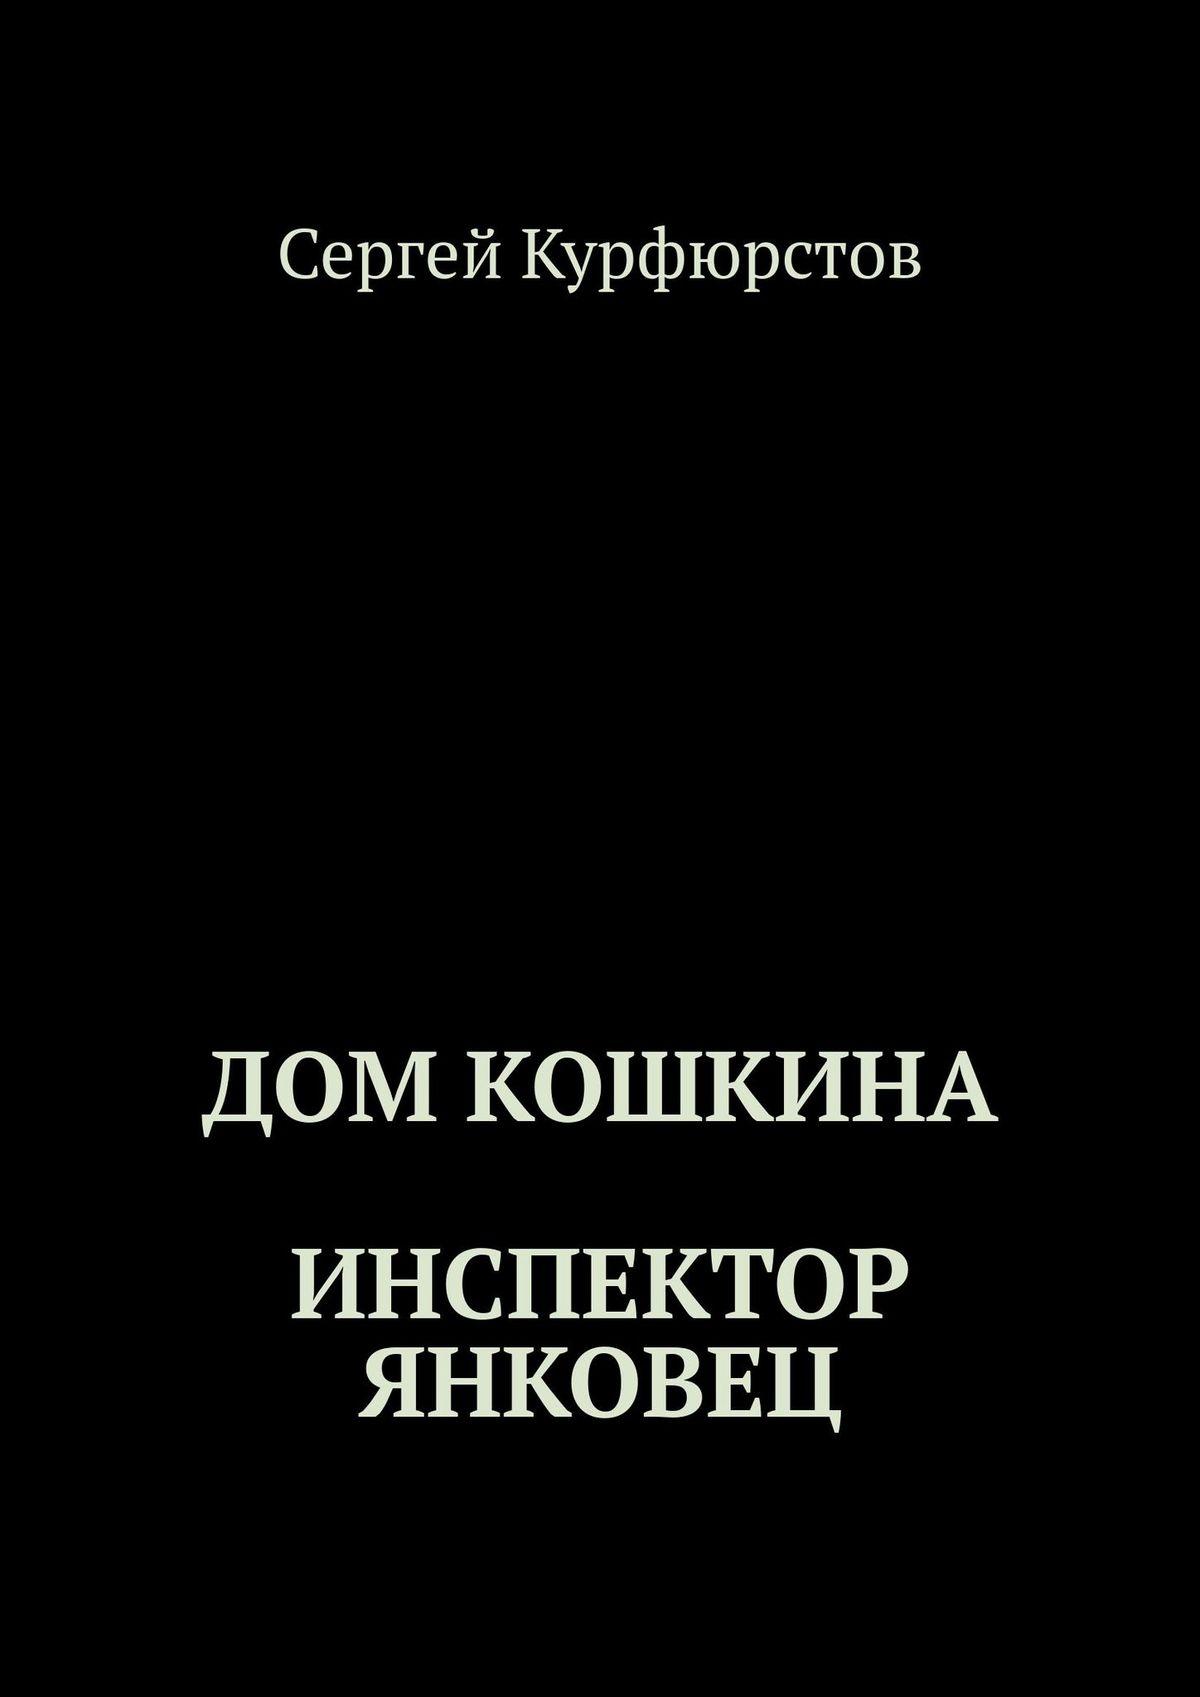 Сергей Курфюрстов Дом Кошкина. Инспектор Янковец кошкина пропись